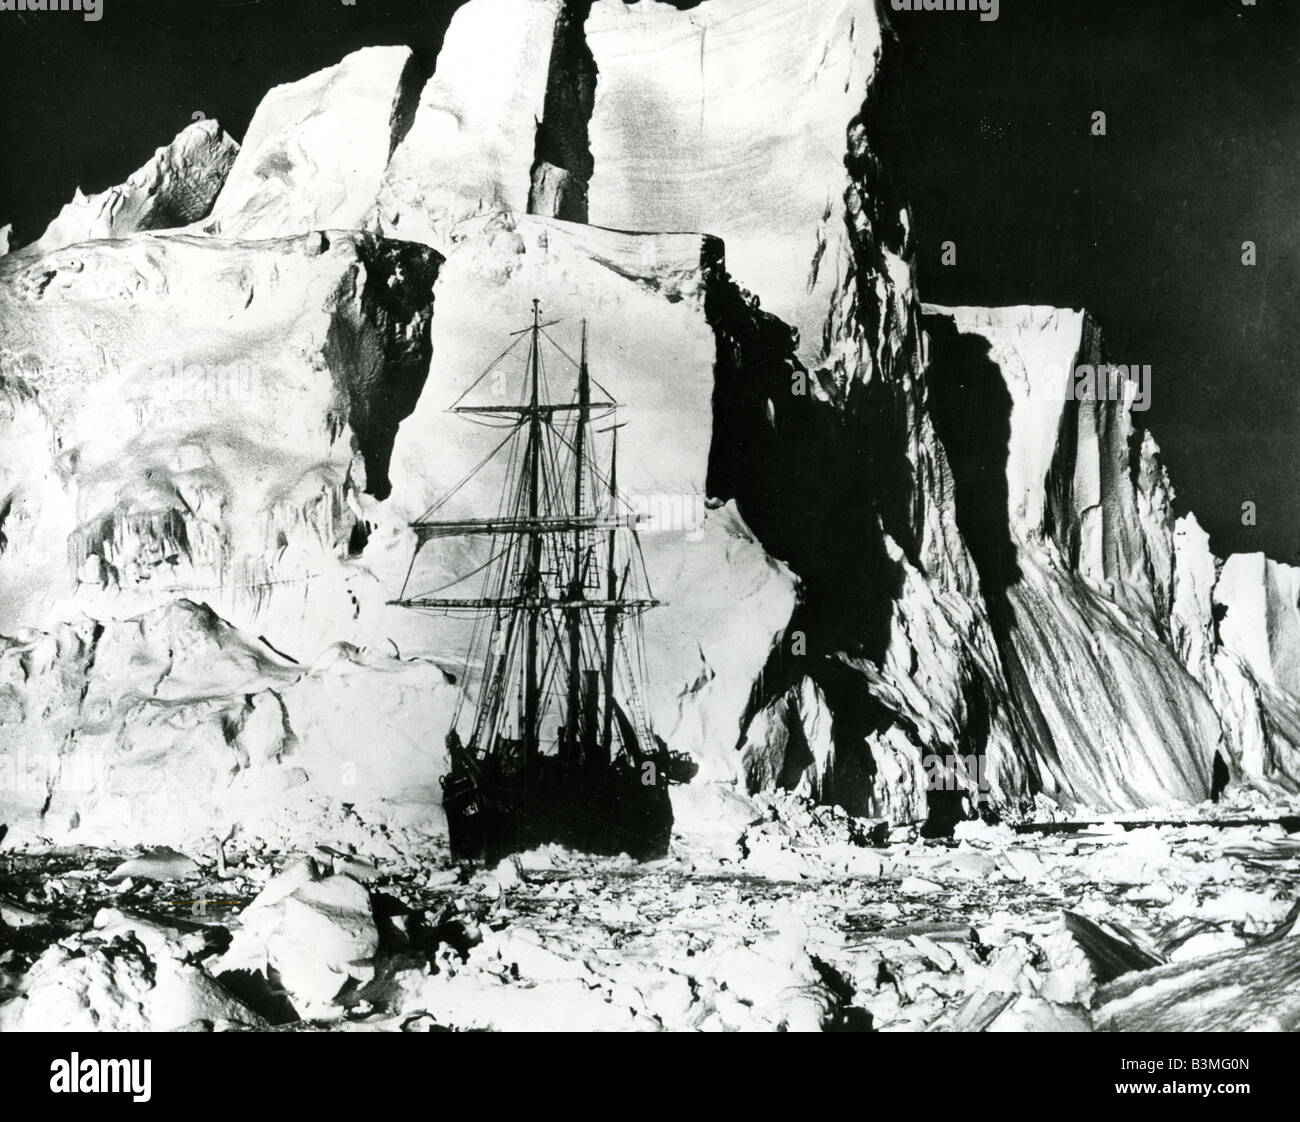 SHACKELTON'S ENDURANCE stuck in the Antarctic ice in 1915 - Stock Image